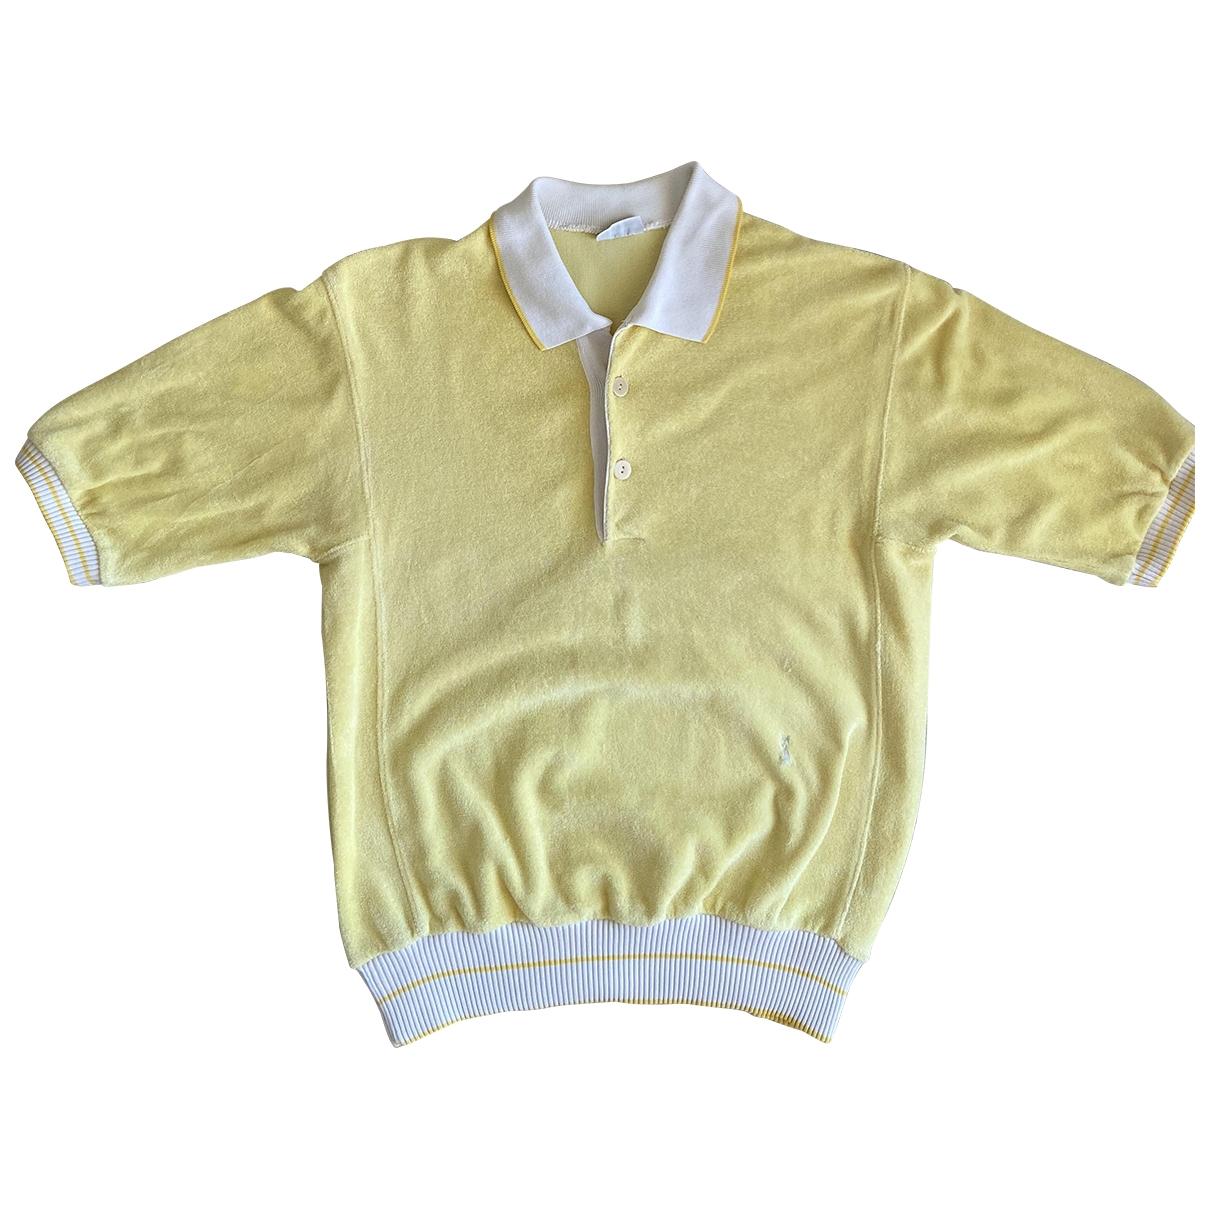 Yves Saint Laurent \N Yellow Cotton  top for Women 48 IT